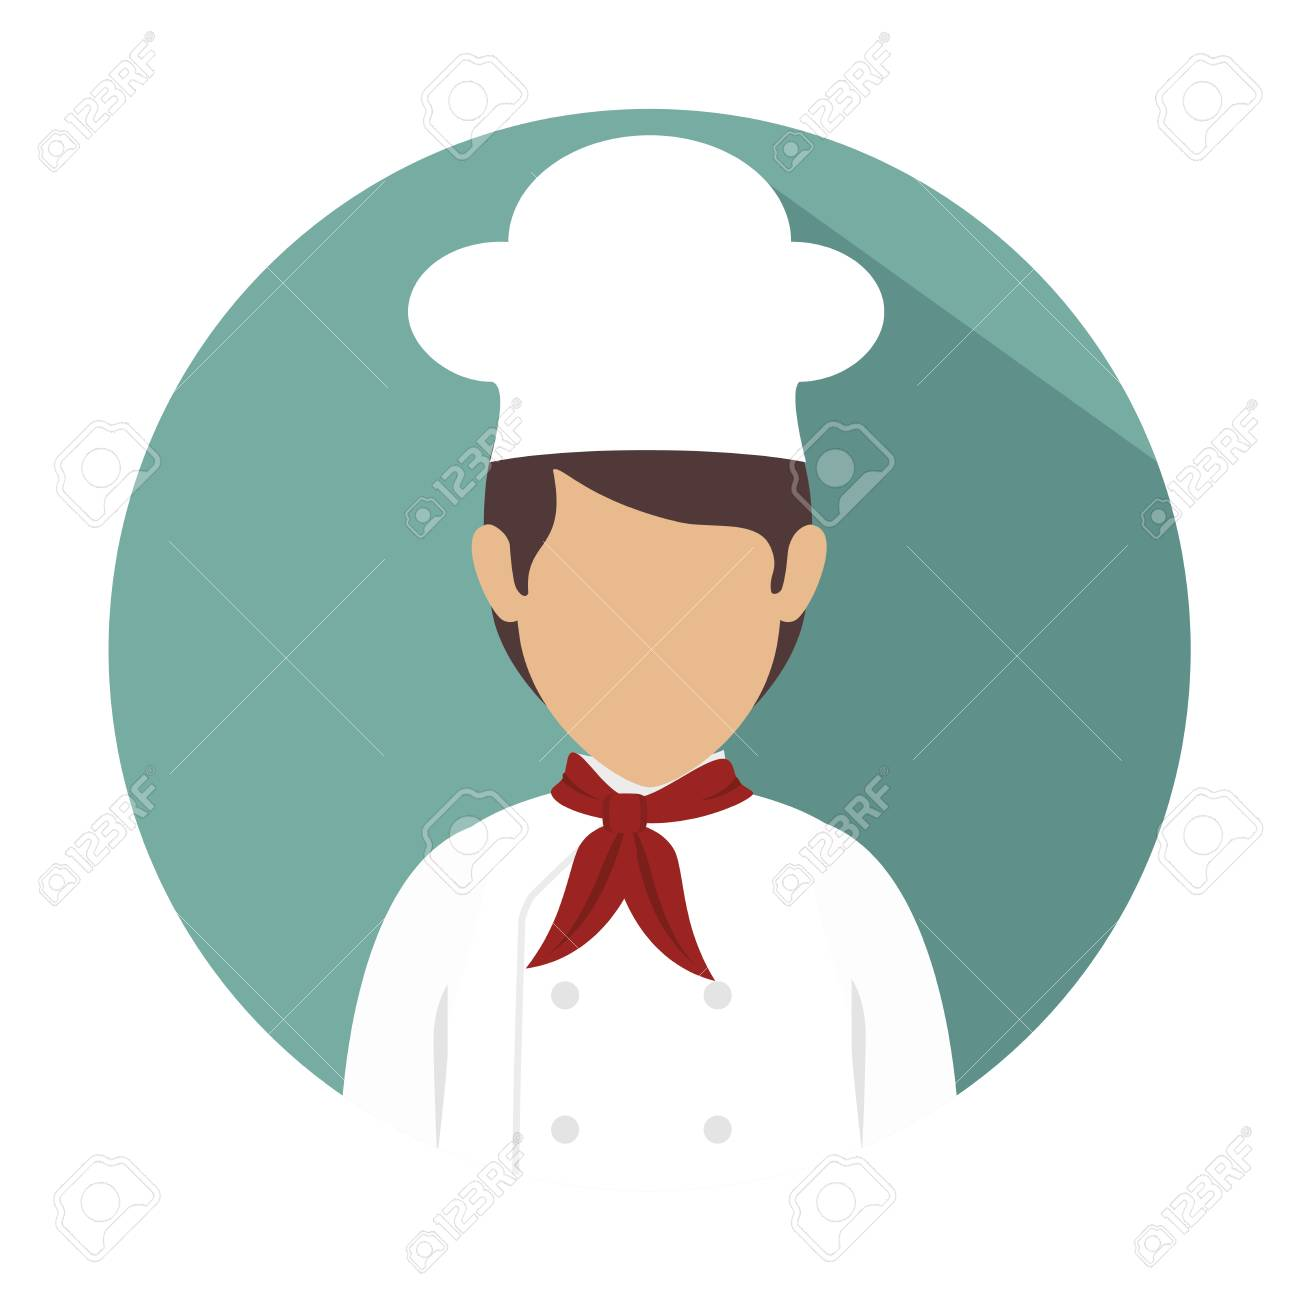 Koch Küche Design, Vektor-Illustration eps10 Grafik